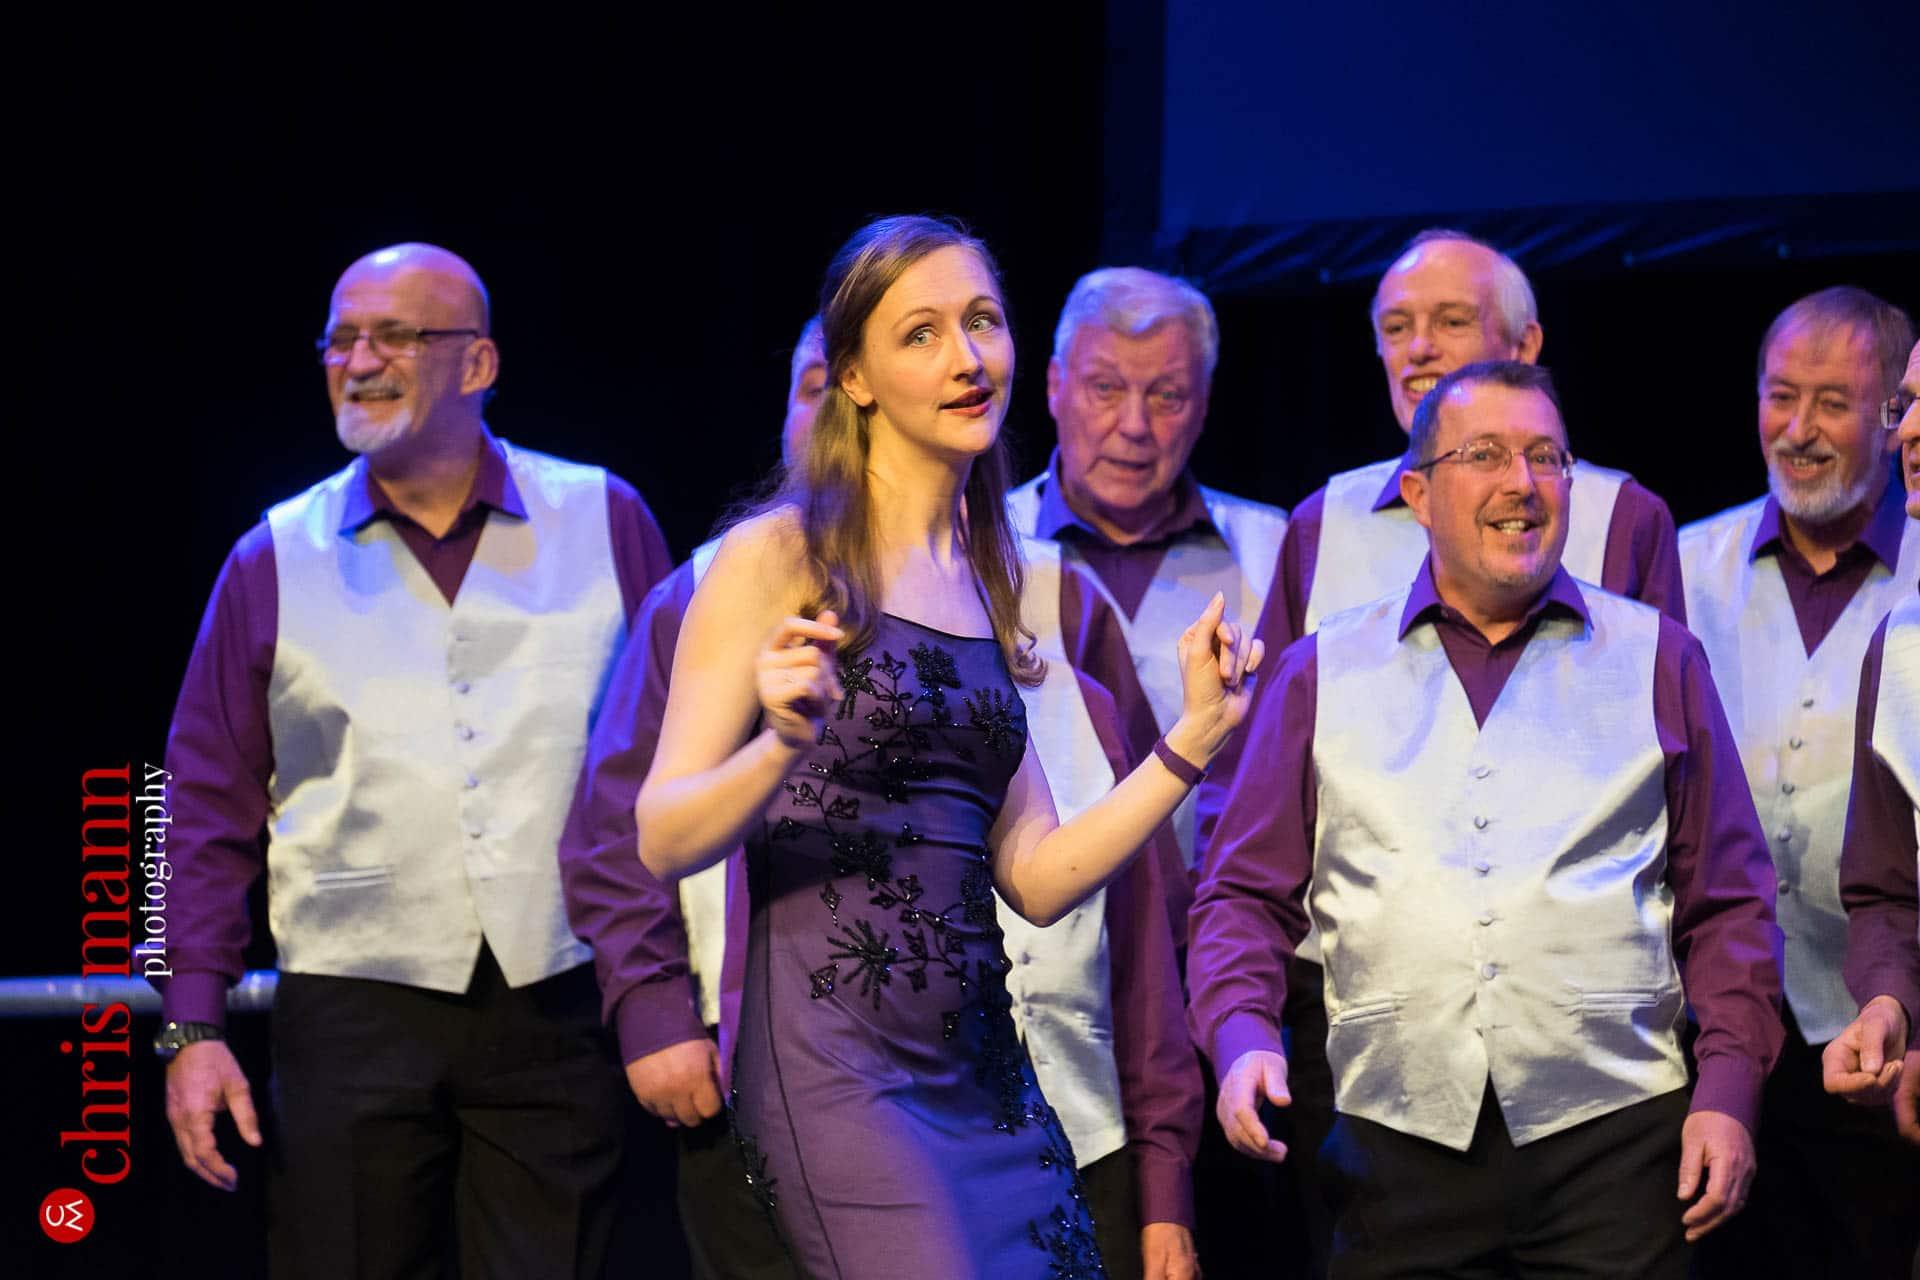 Choiroke-2016-concert-Dorking-Halls-053